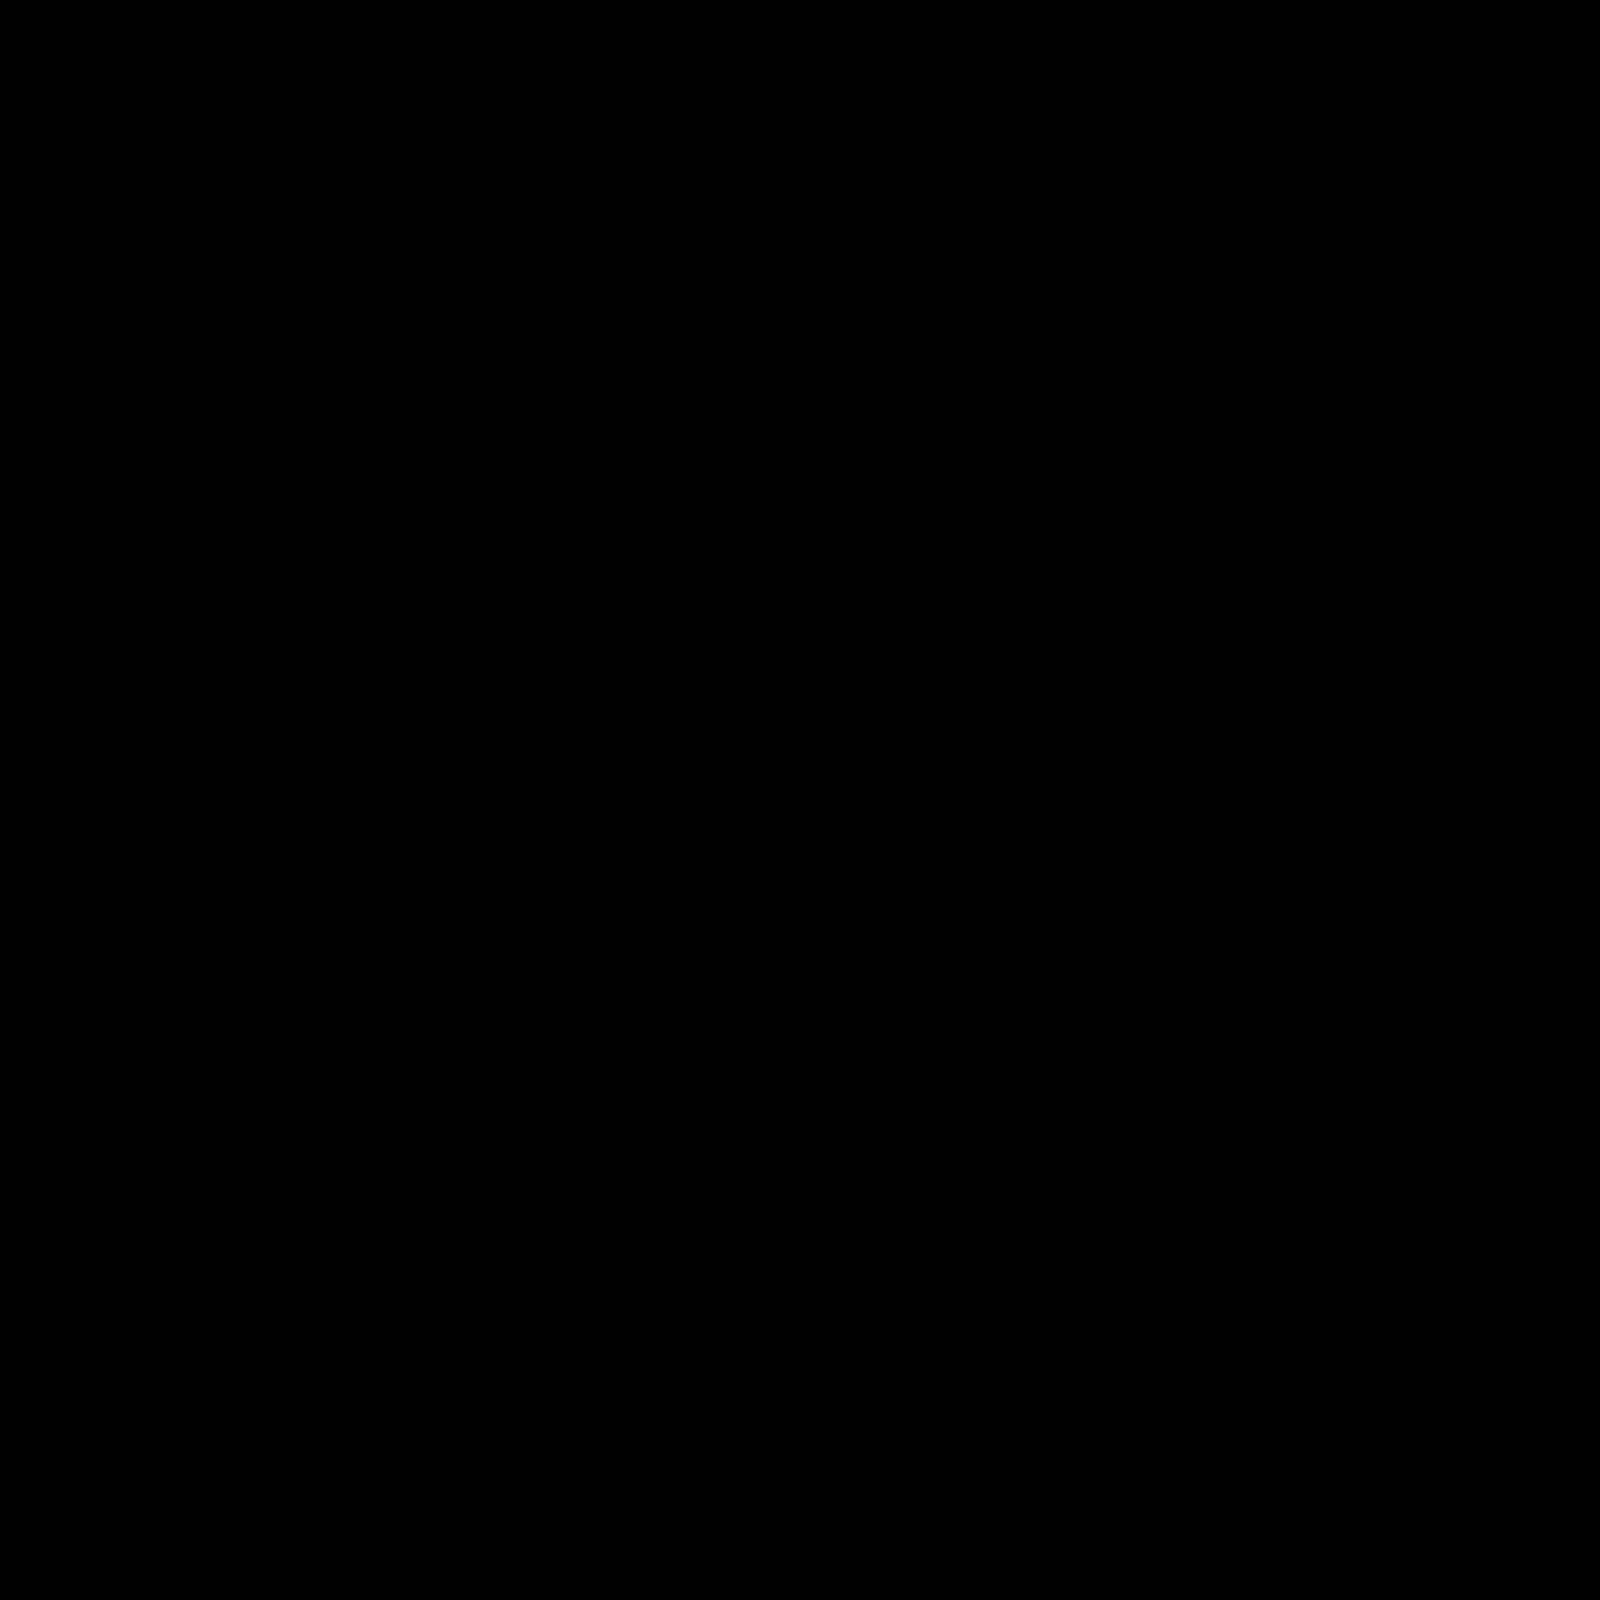 Cioccolata Calda icon